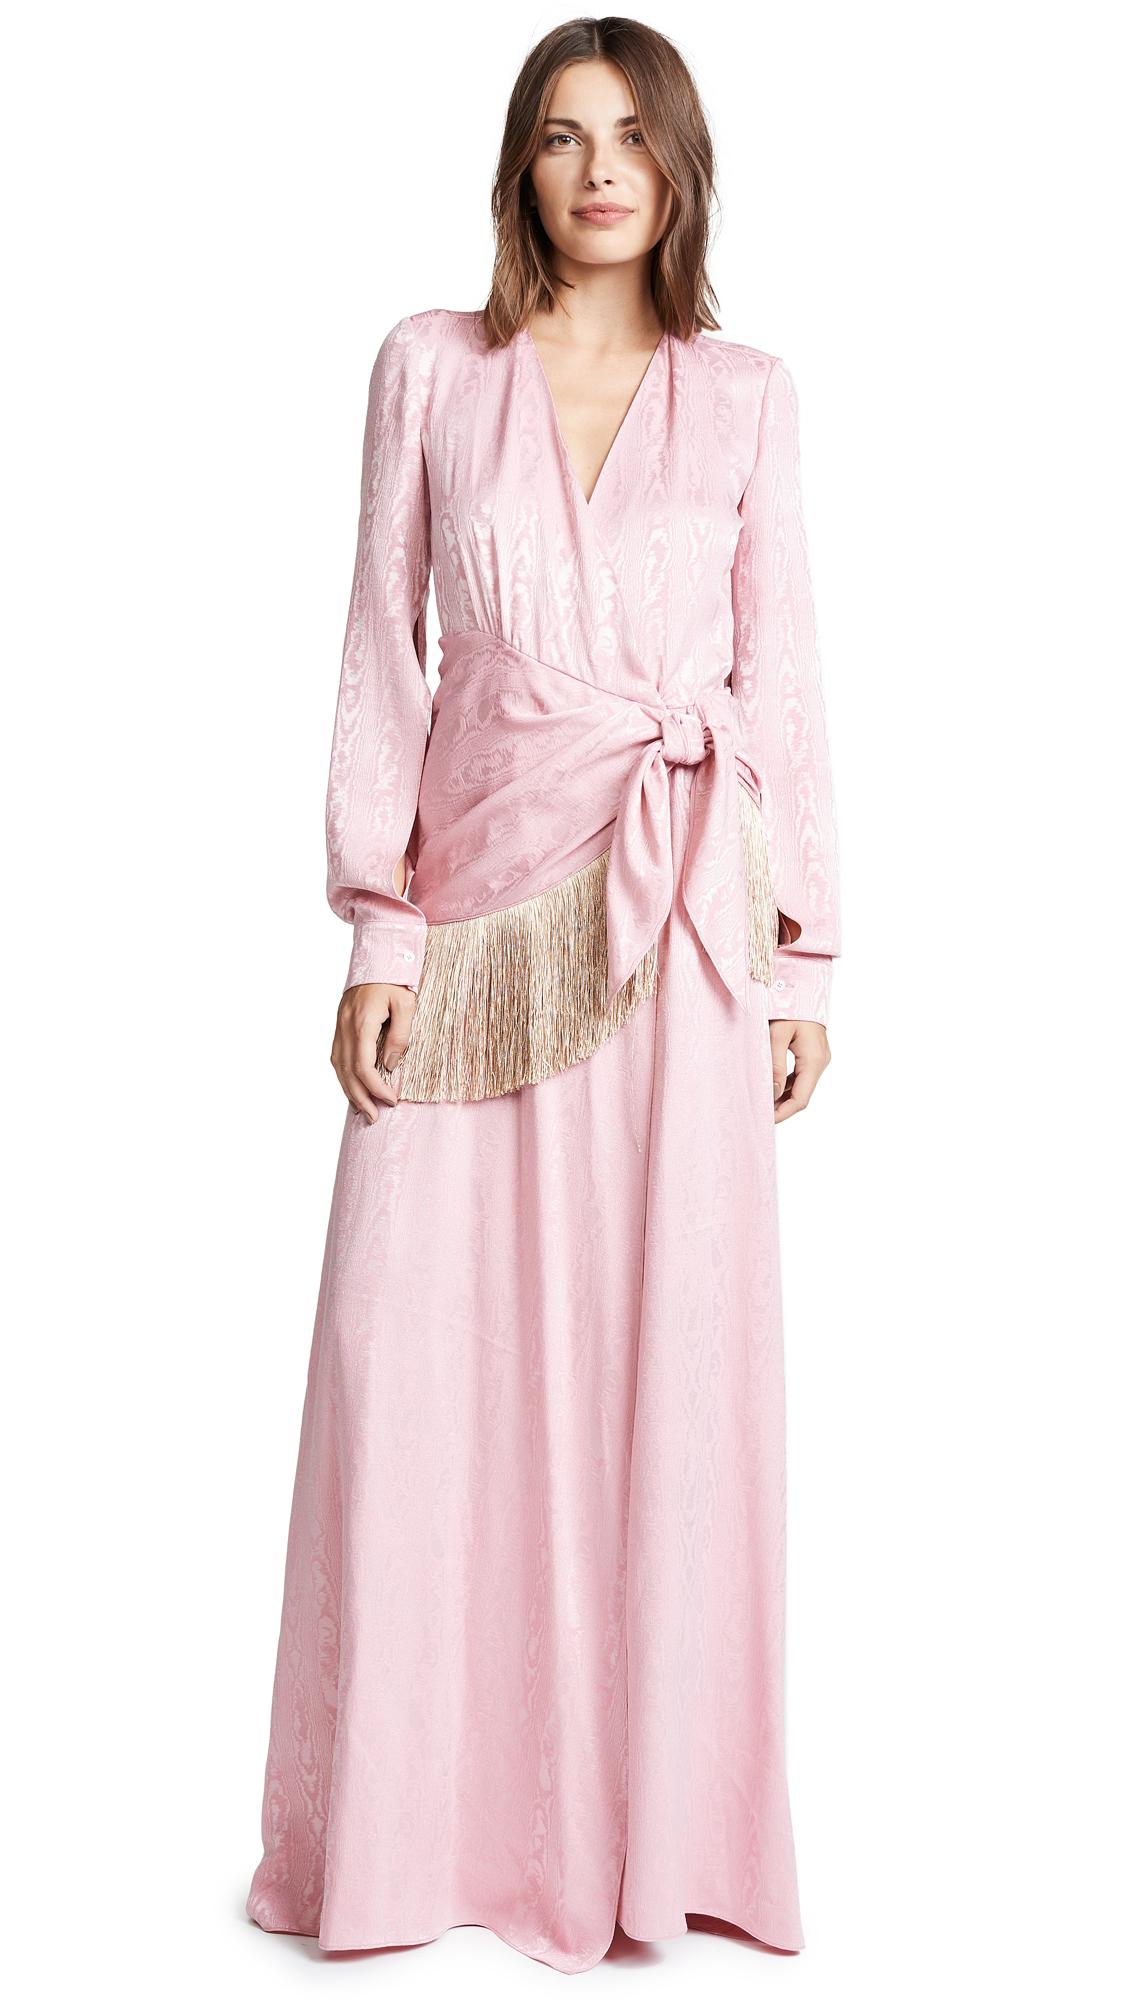 HELLESSY EMERSON WRAP DRESS